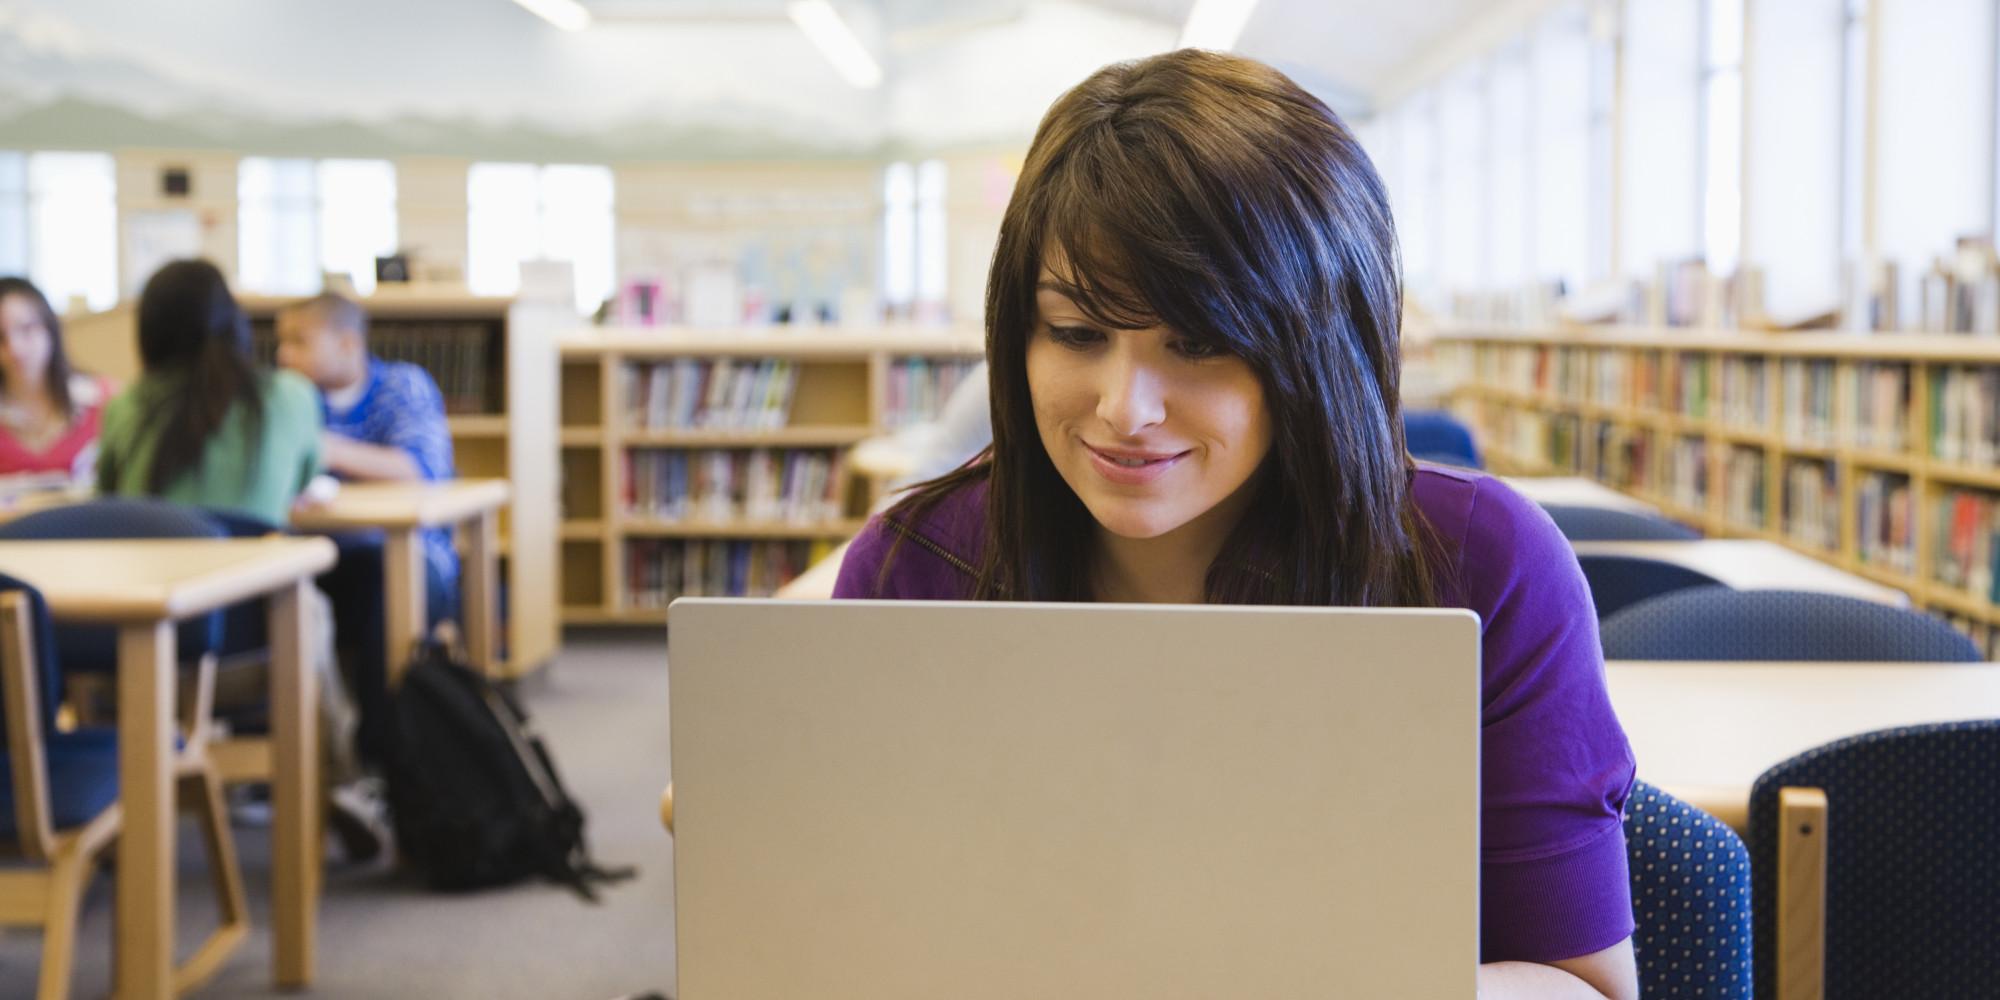 Girl hot teen using computer shes hot